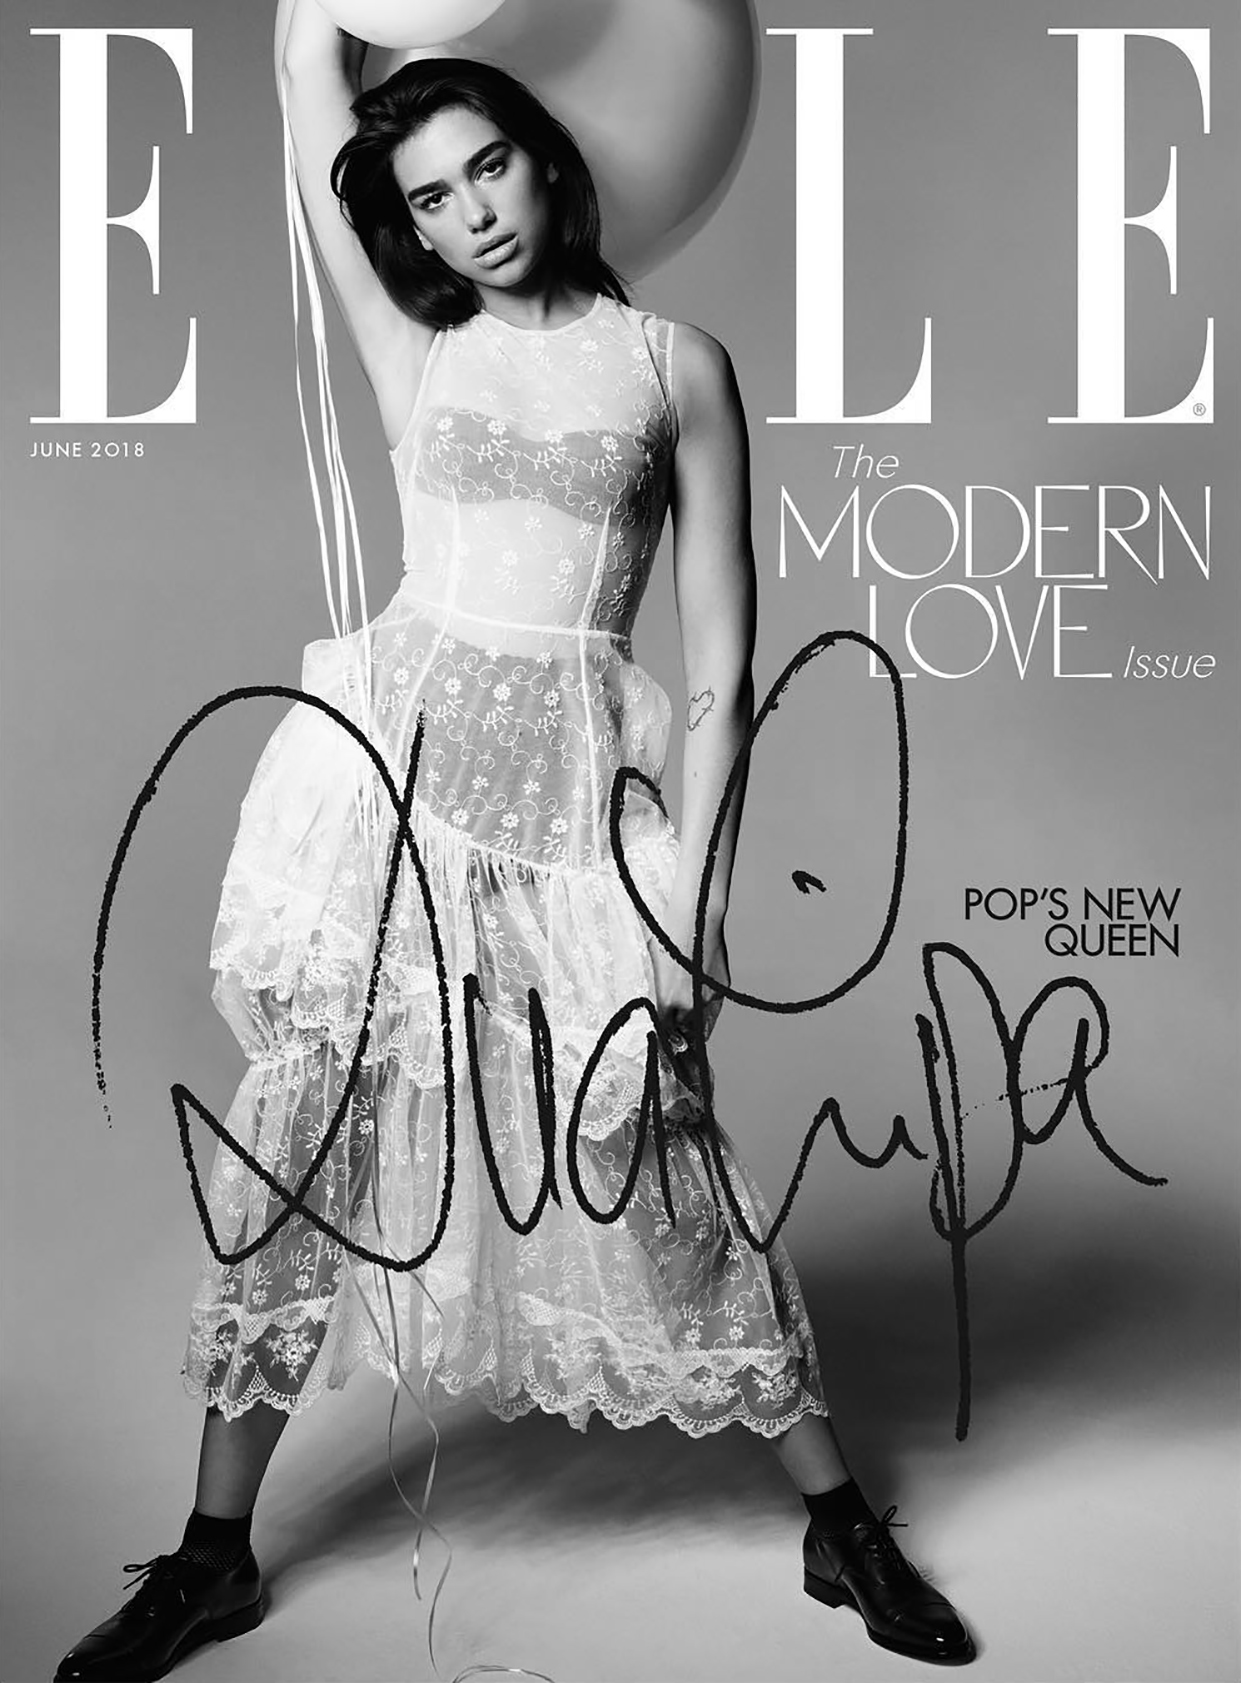 Dua Lipa by Liz Collins for Elle UK June 2018 (5).jpg